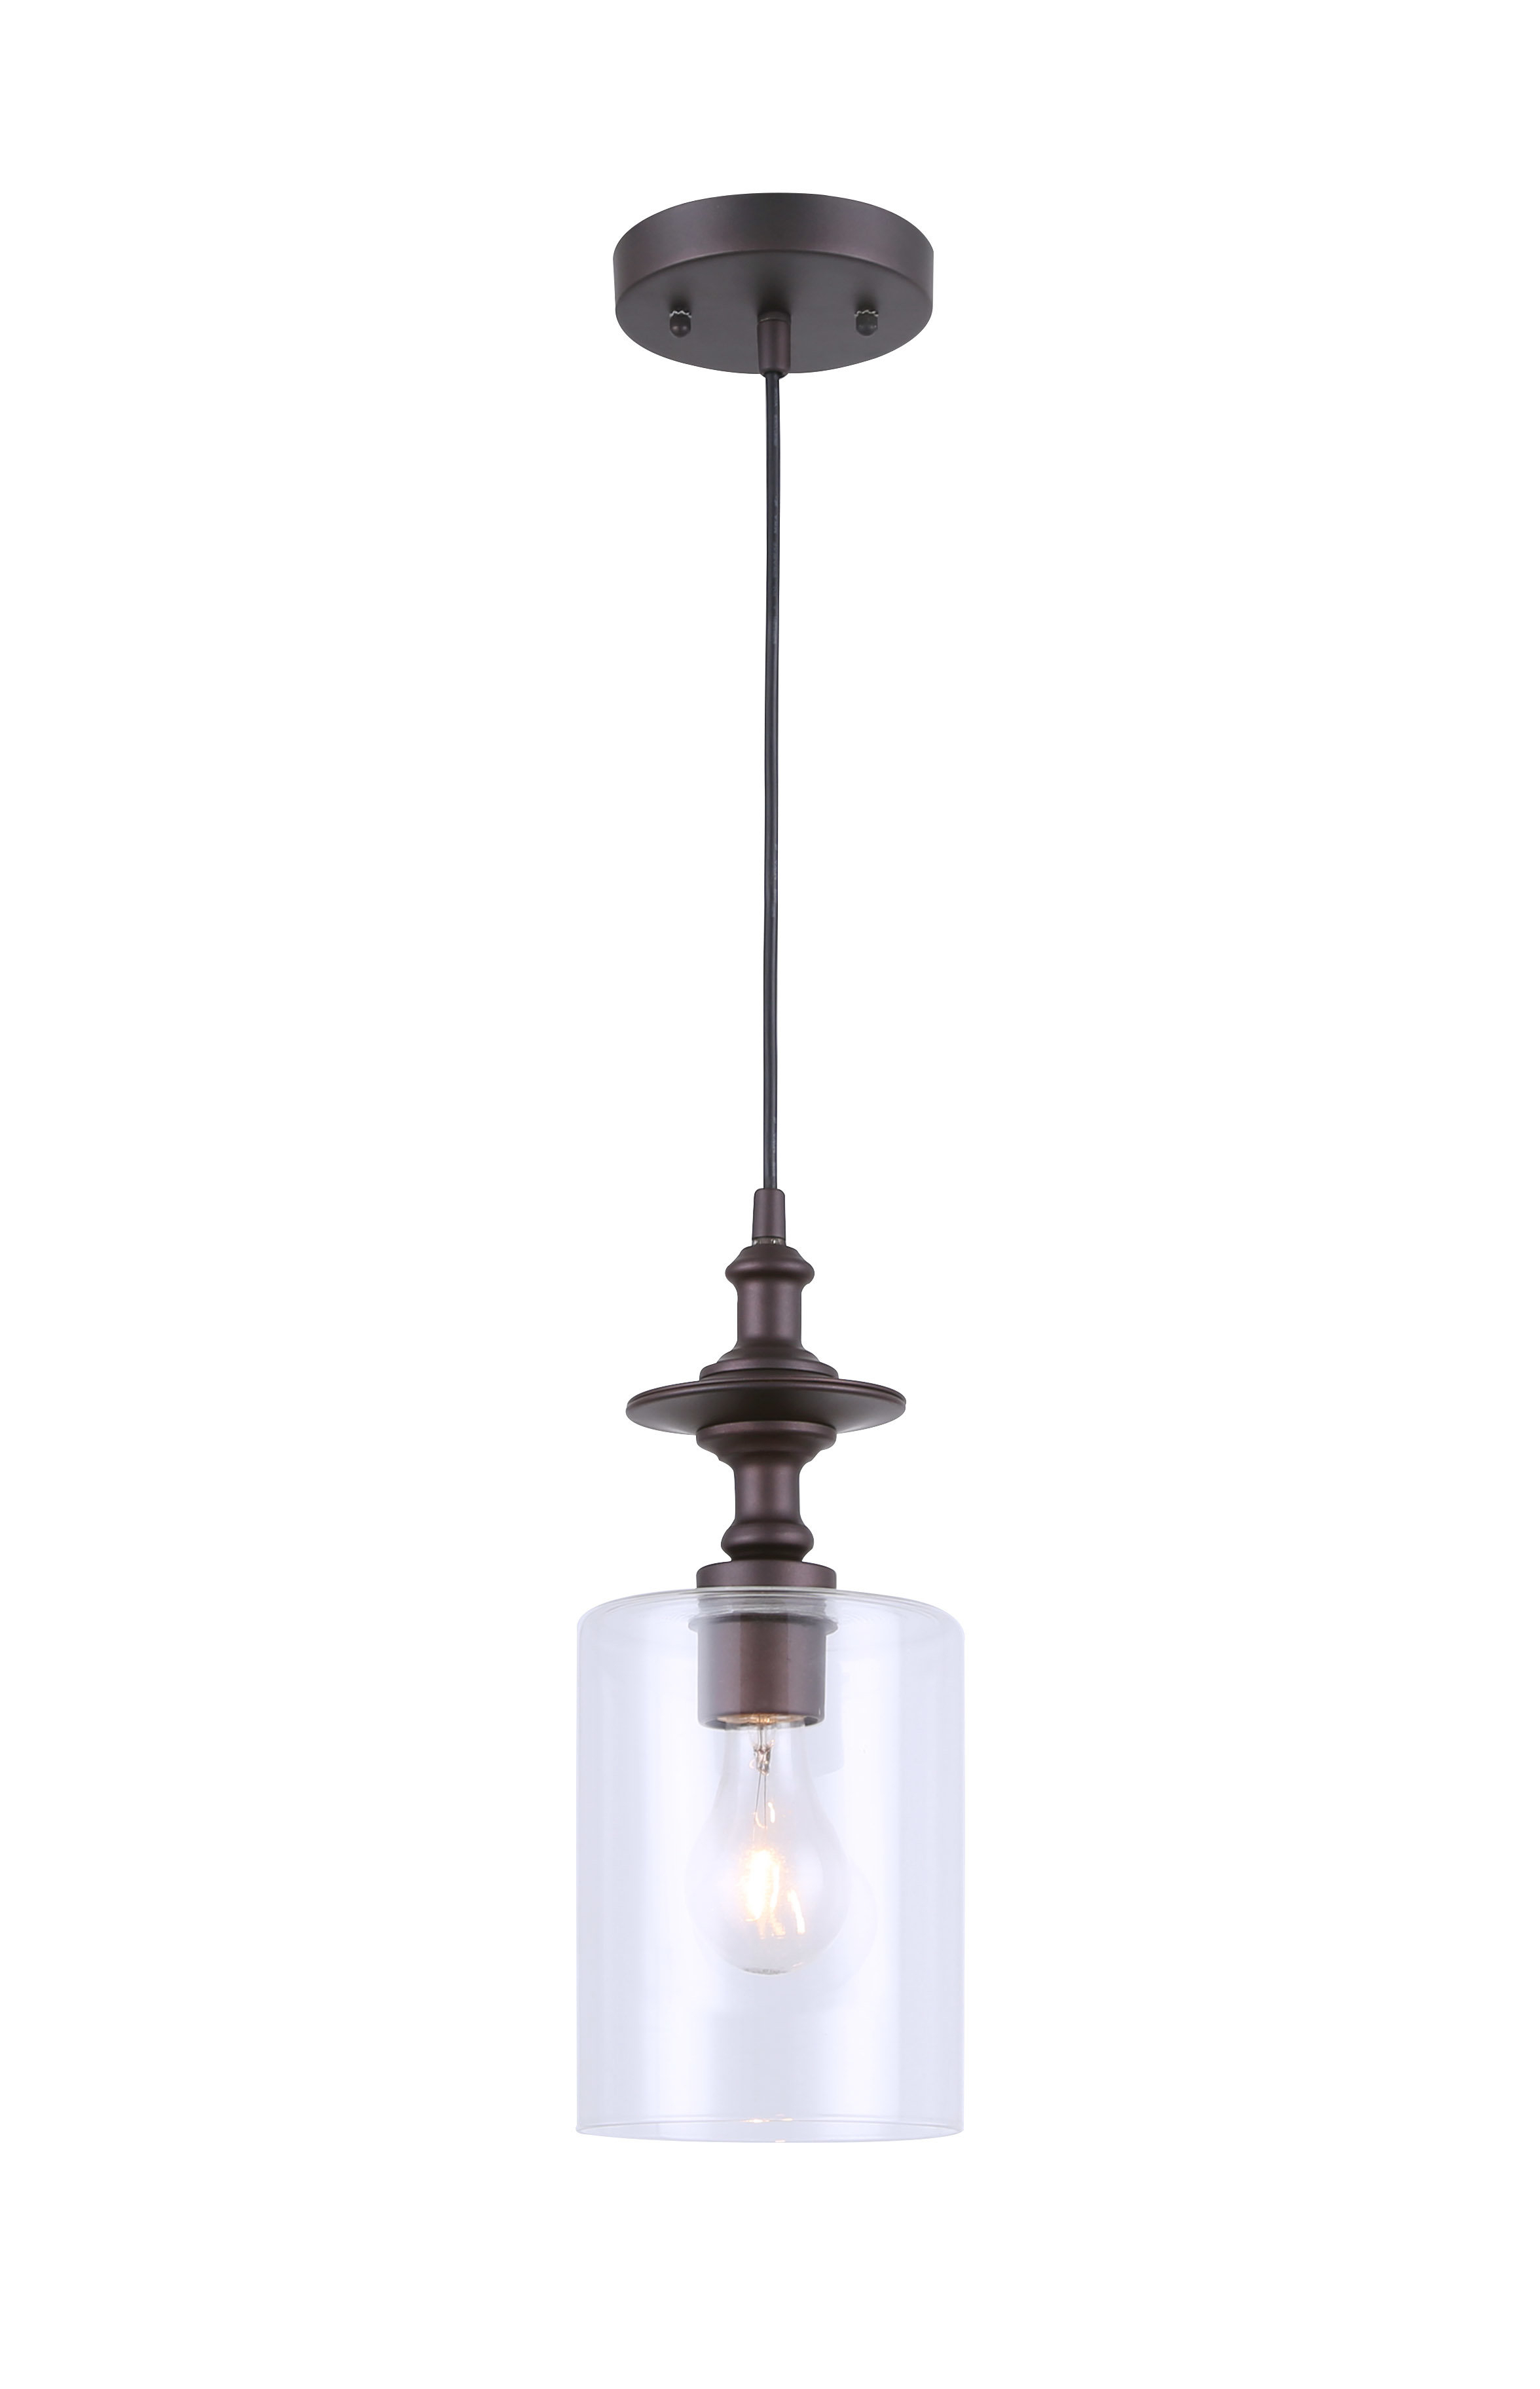 Popular Wadlington 6 Light Single Cylinder Pendants Throughout Cylinder Pendant Lighting (View 13 of 20)